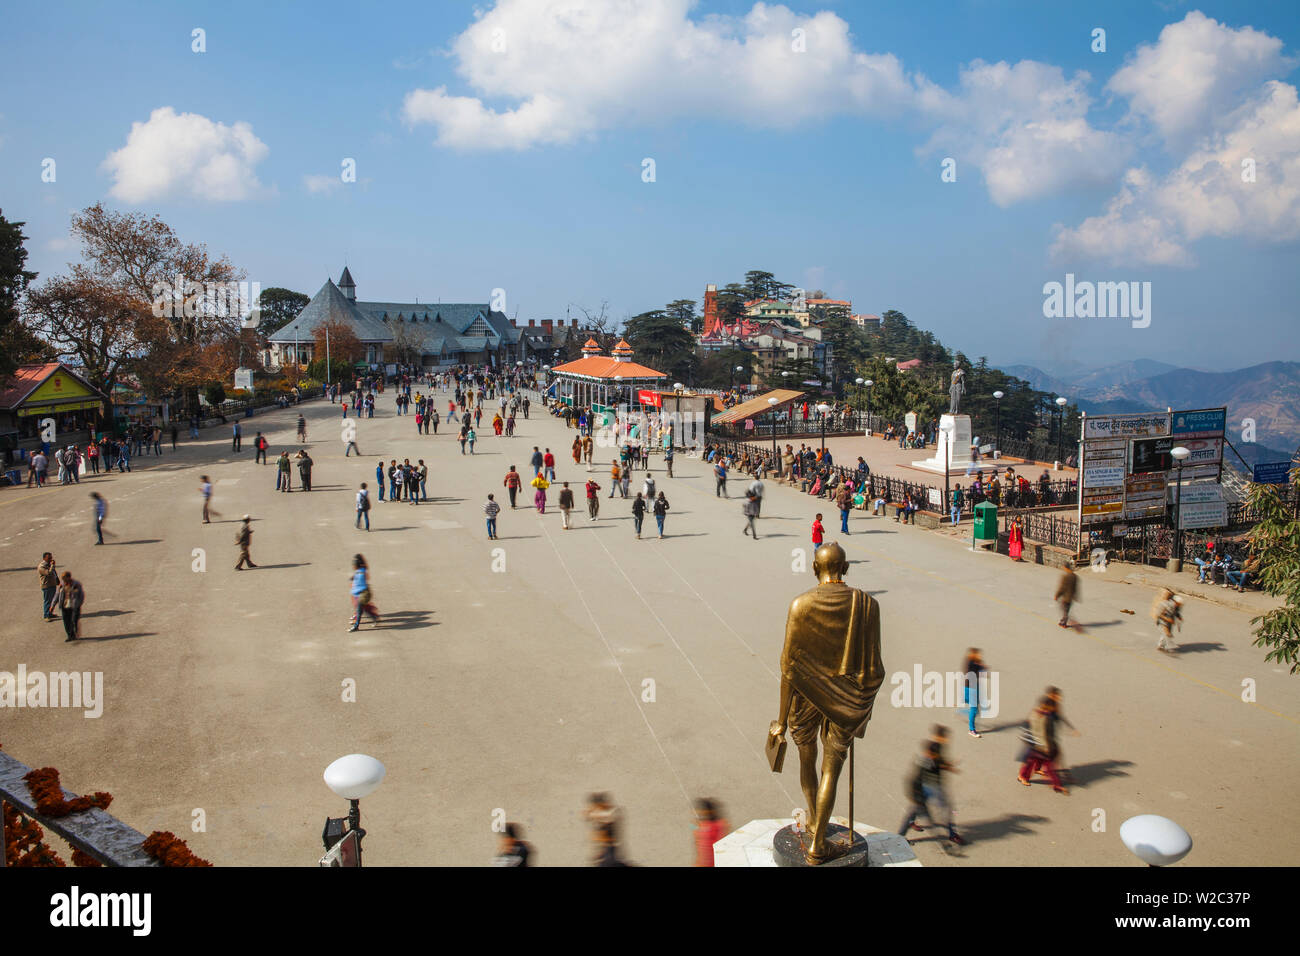 India, Himachal Pradesh, Shimla,  The Ridge, Gold Statue of  Mahatma Gandhi - Stock Image